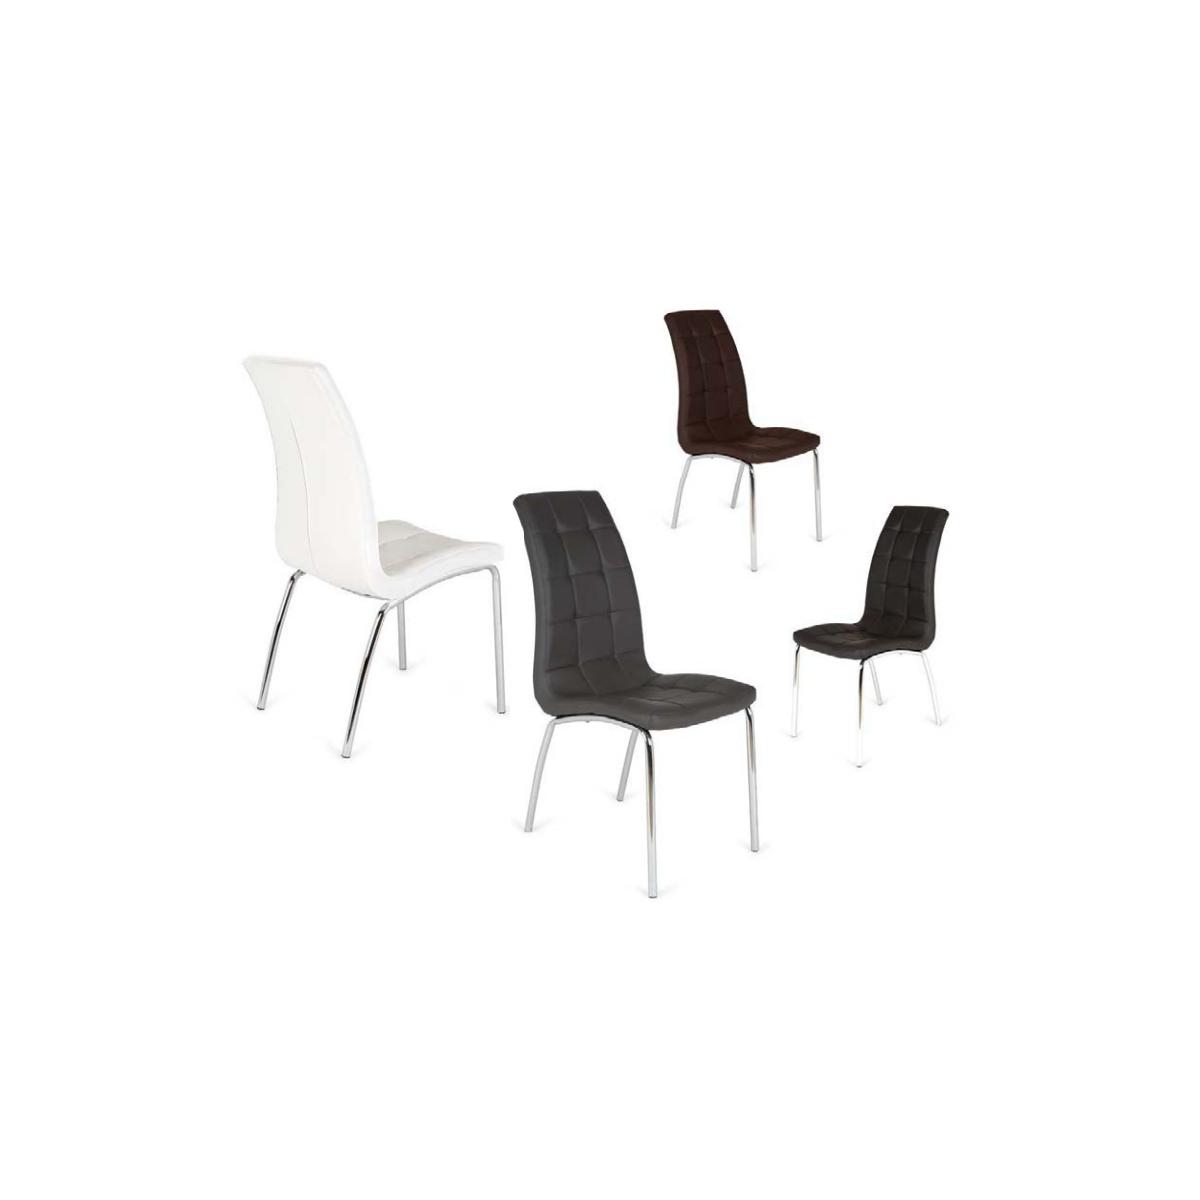 Pack silla comedor tapizada san sebastian 4 sillas mubeko for Pack sillas comedor